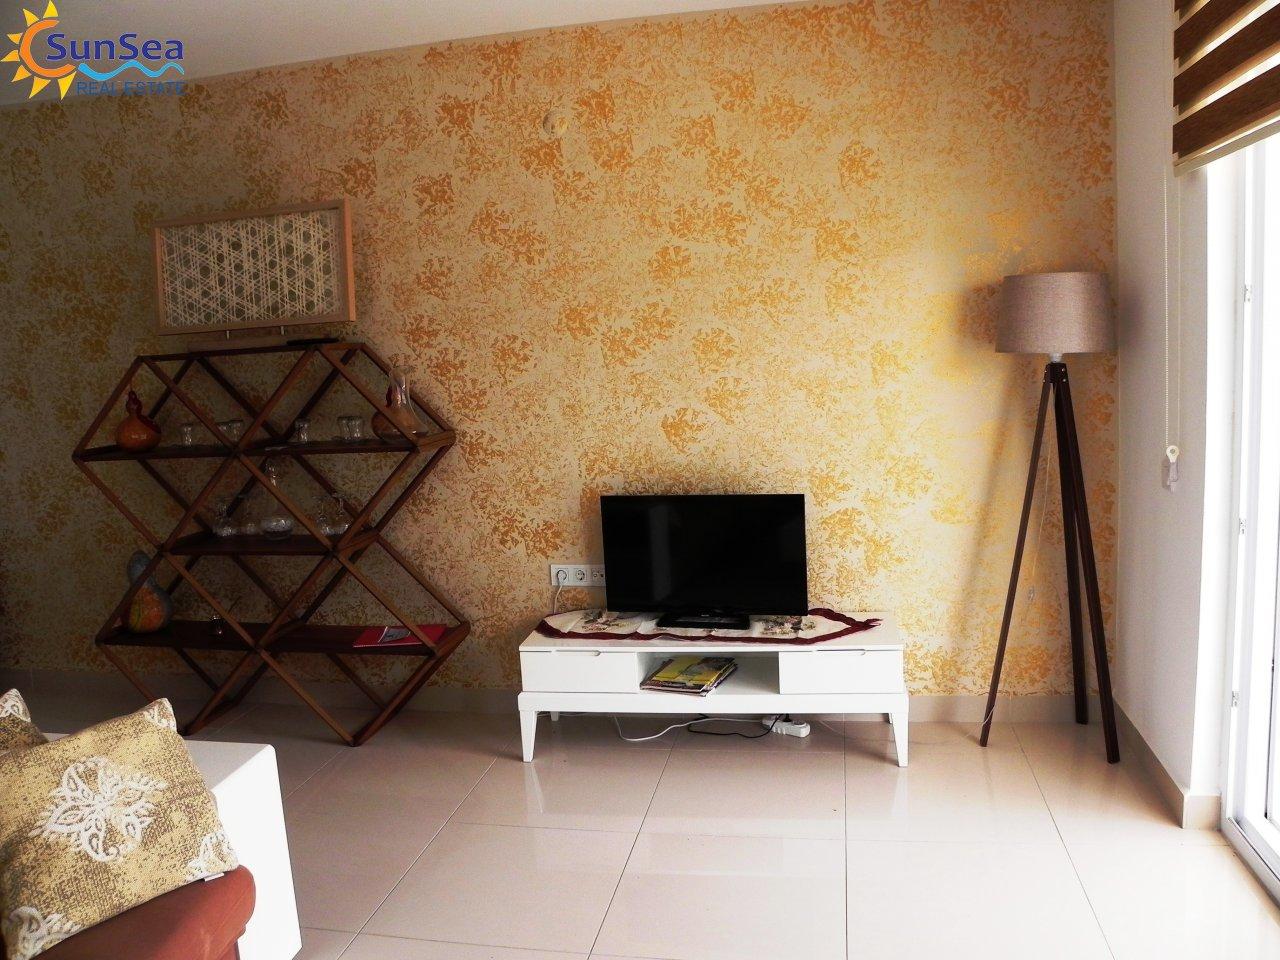 alanya fortuna resort tv